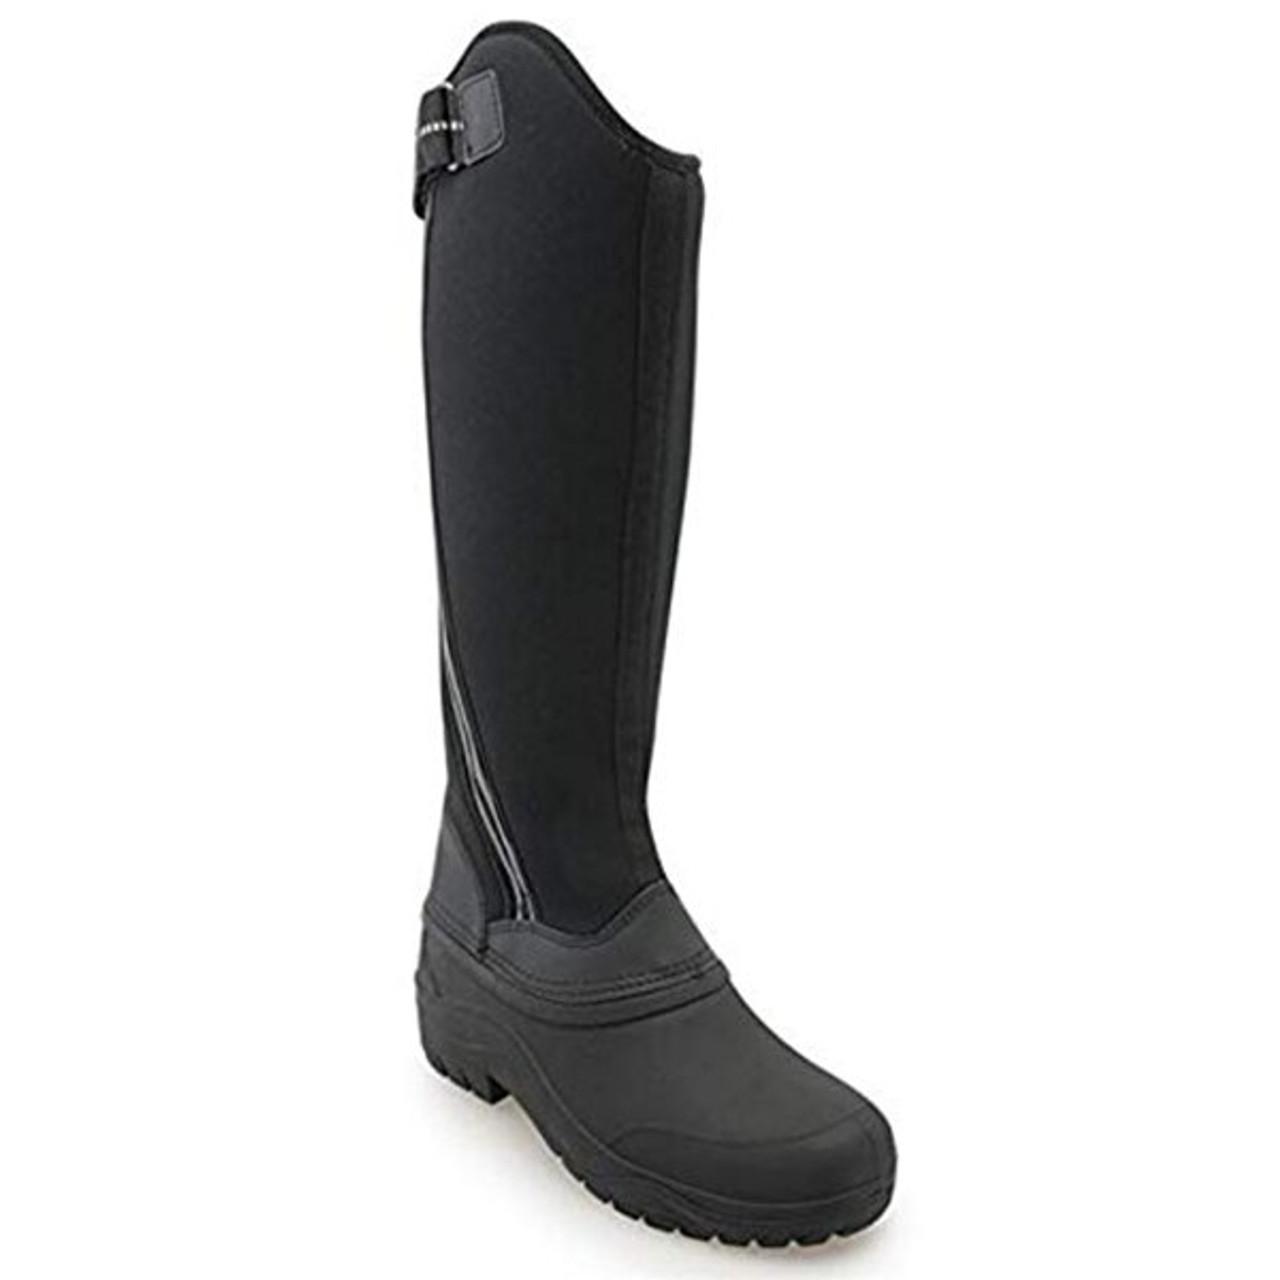 c95cc379a8b Harry Hall Winter Frost Ladies Boots - Black